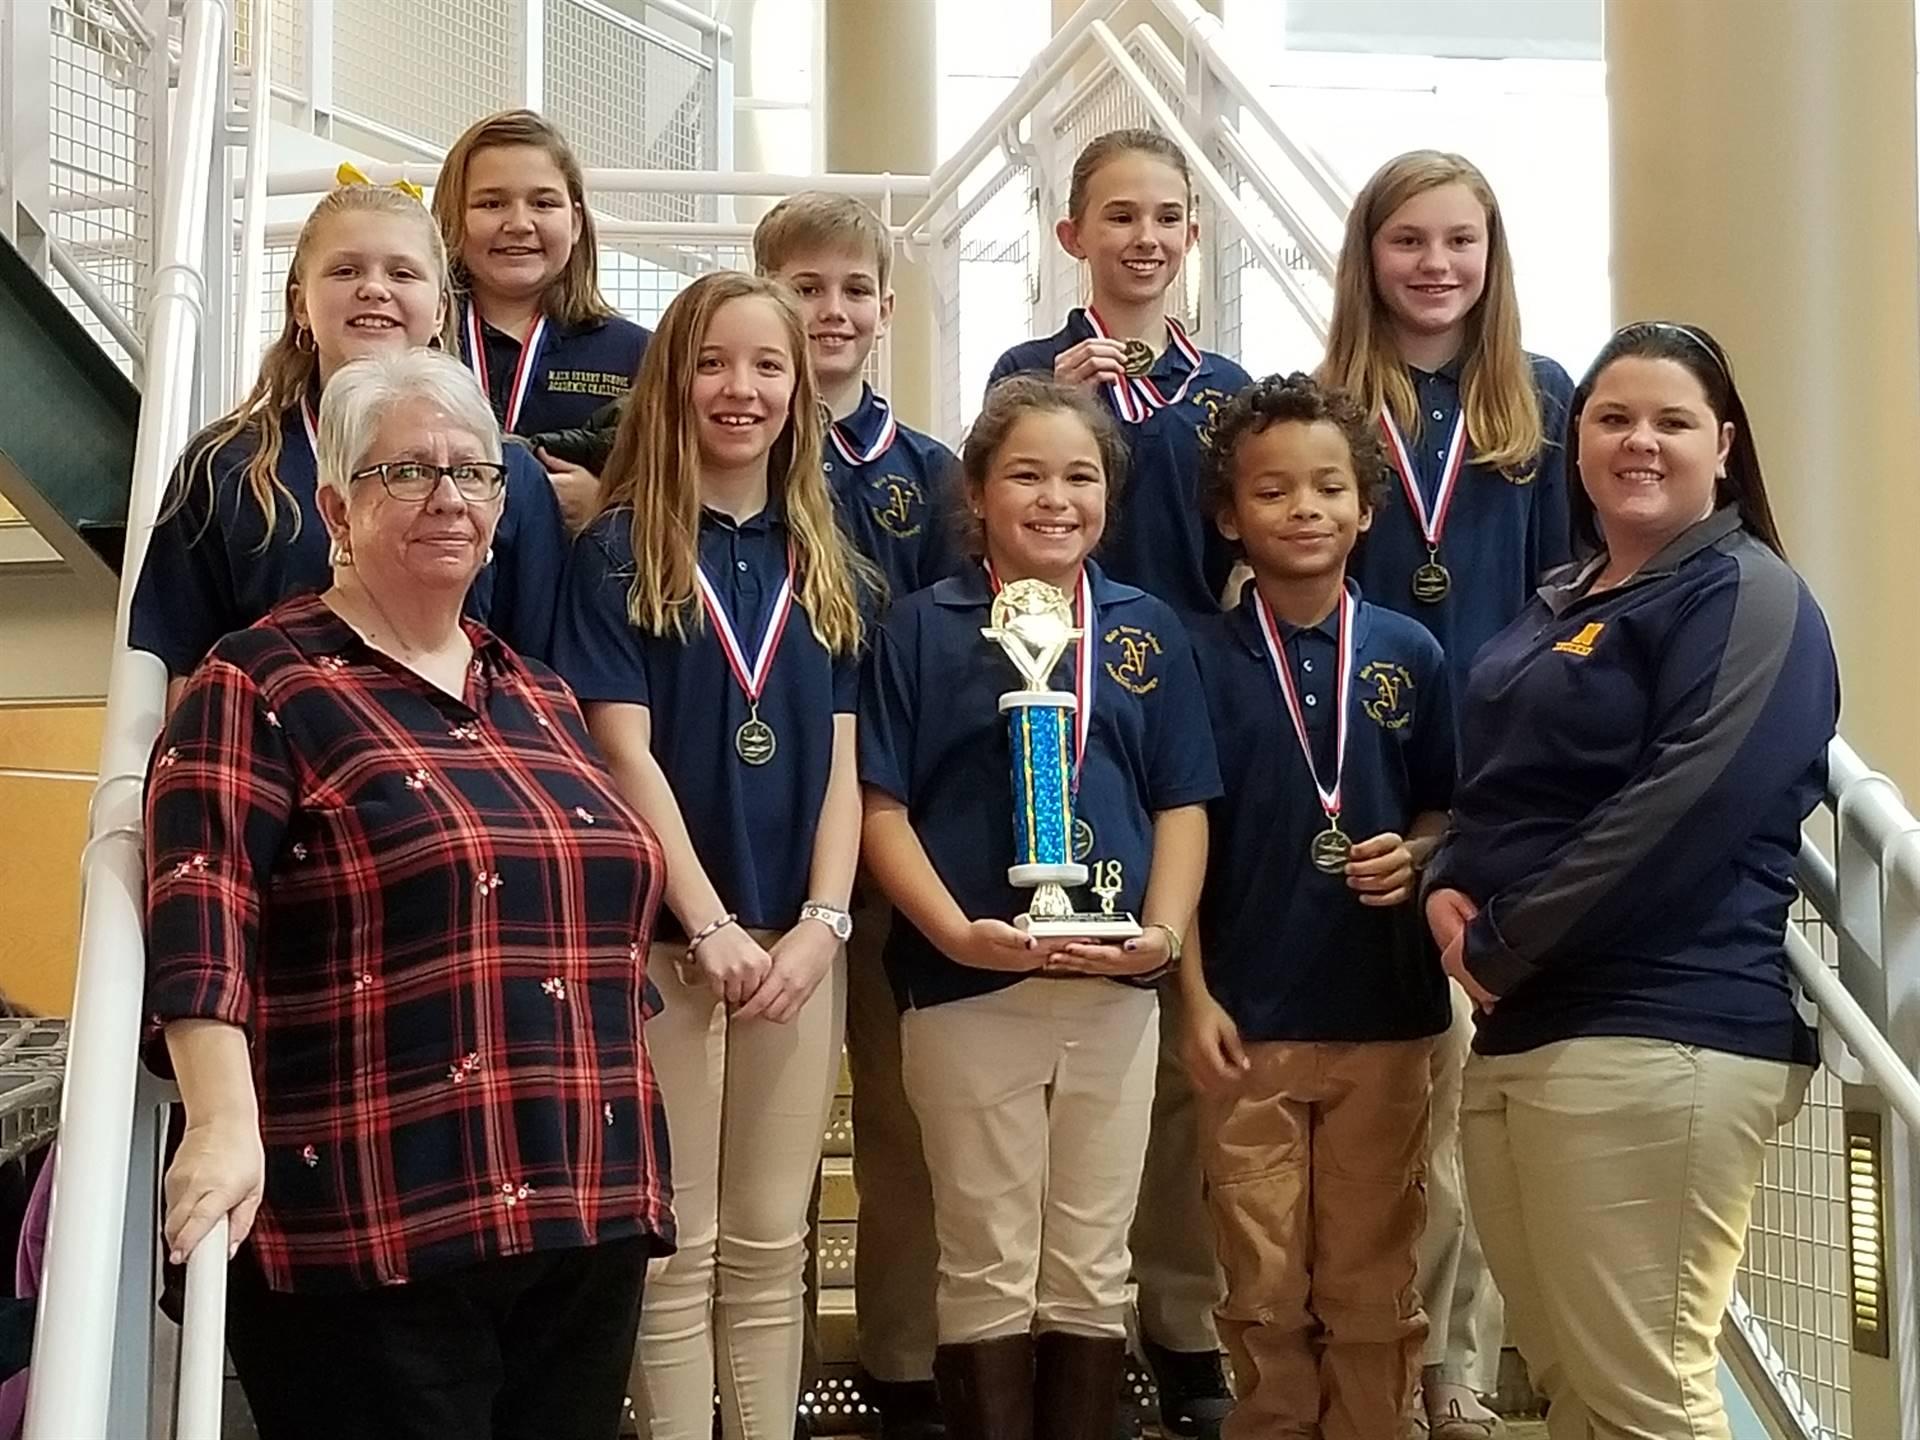 Academic Challenge Quad County Champs at Main Street School - grade 5